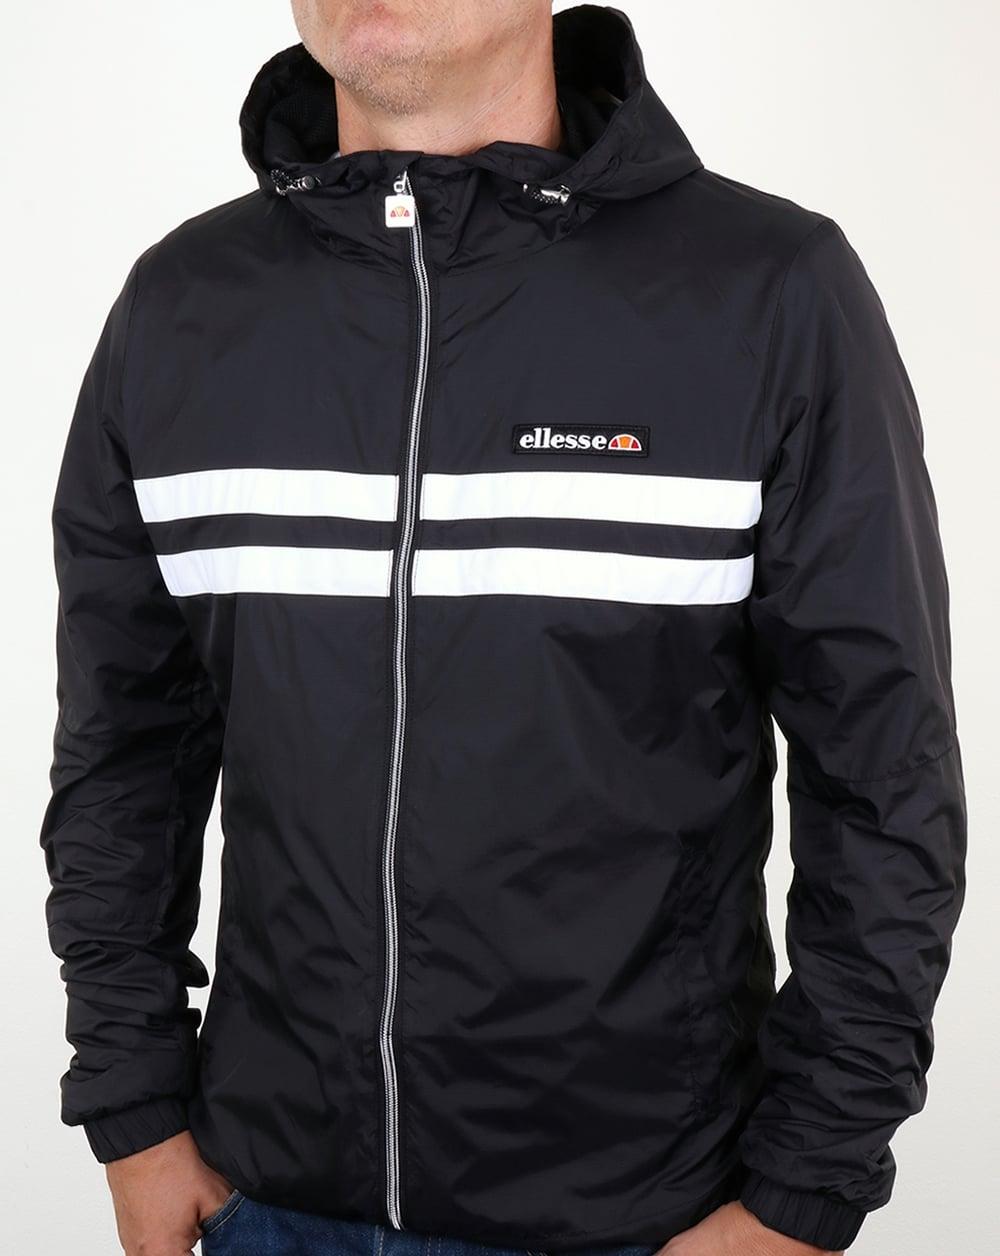 ellesse rimini striped rain jacket black citerna waterproof windbreaker mens. Black Bedroom Furniture Sets. Home Design Ideas